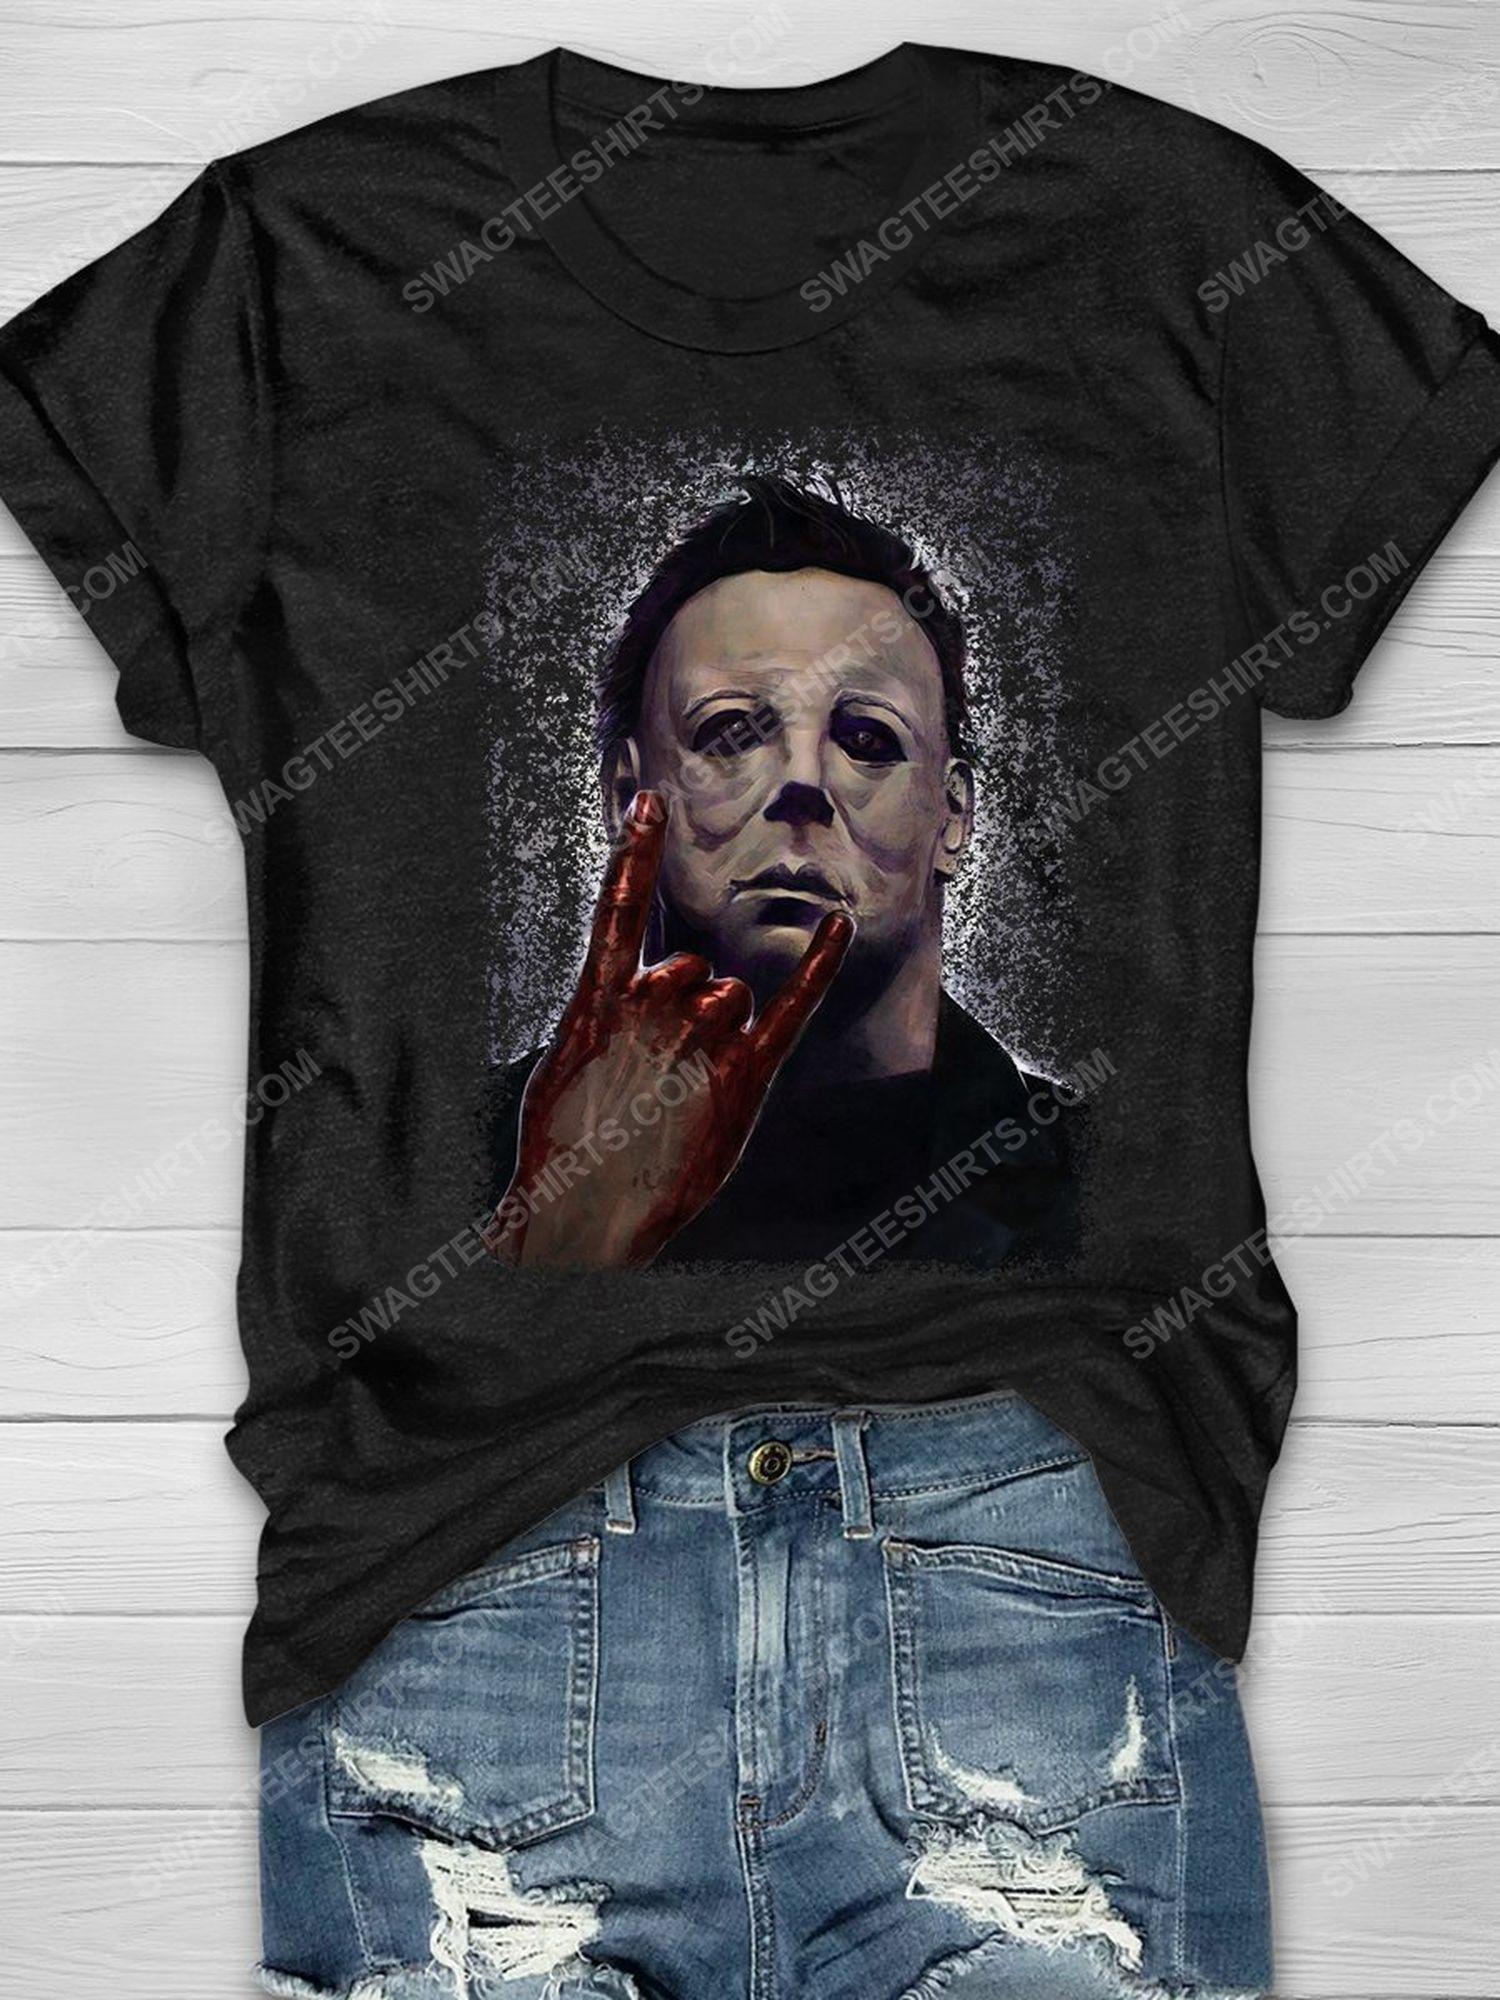 Michael myers scary movies rock hand halloween shirt 1 - Copy (3)